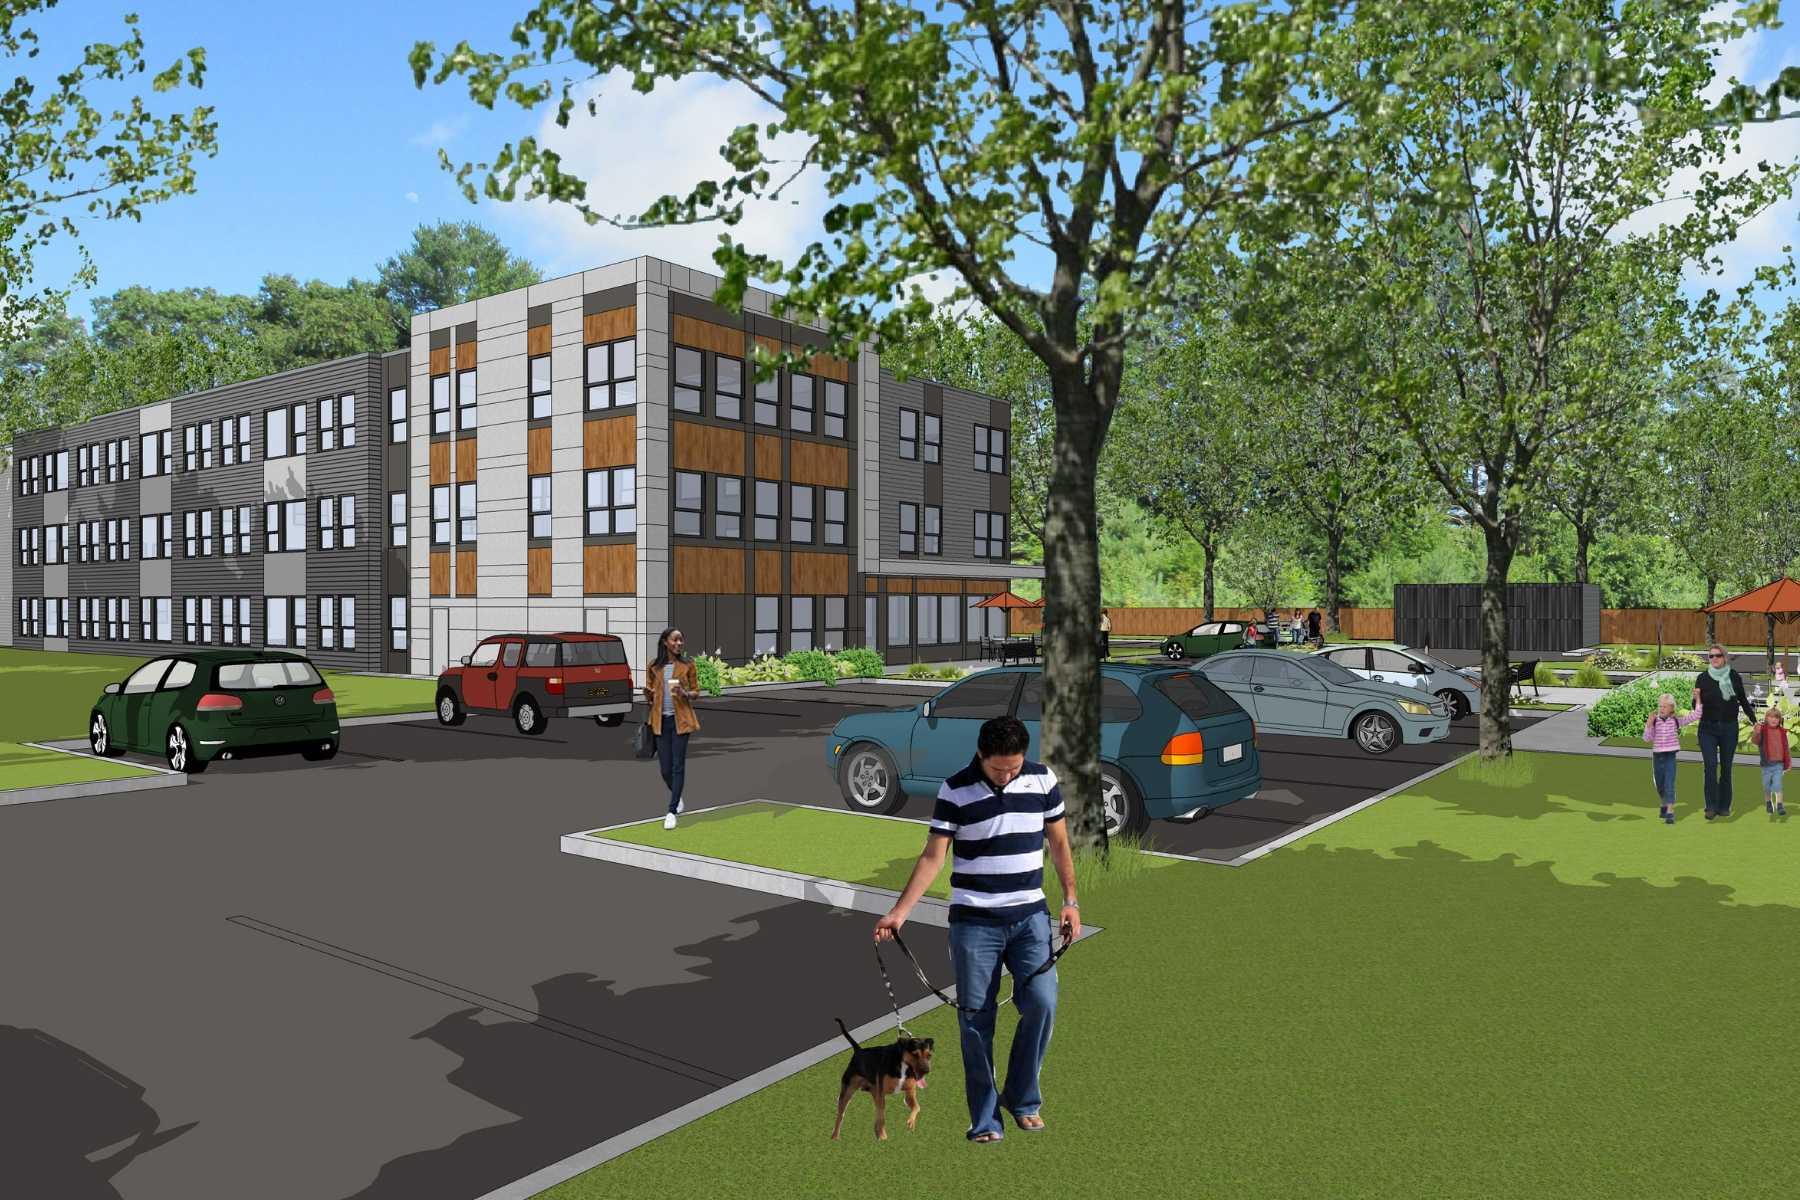 2-CapstoneCommunities-property-McElwainSchoolApartments-Bridgewater.jpg